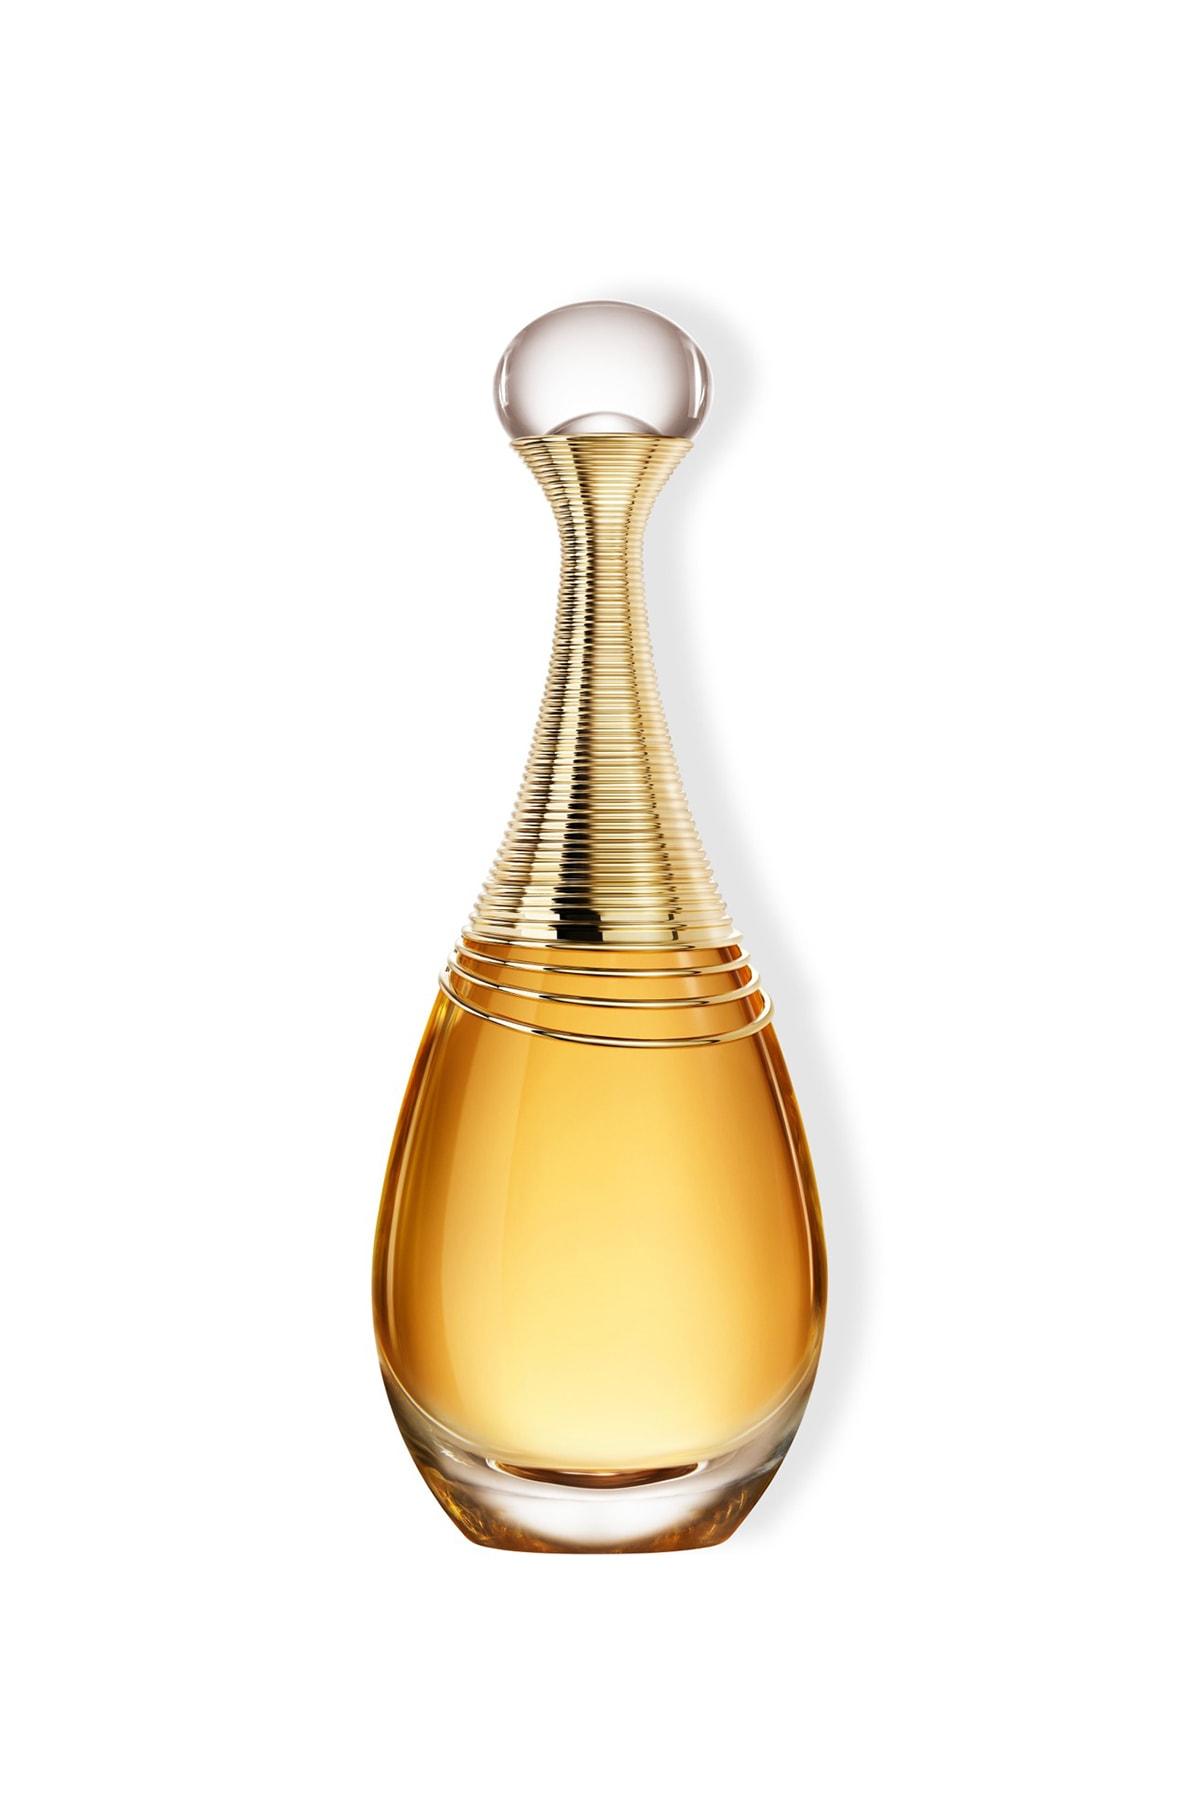 Christian Dior Jadore Infinissime Edp Kadın 100 ml Parfüm  3348901521512 1